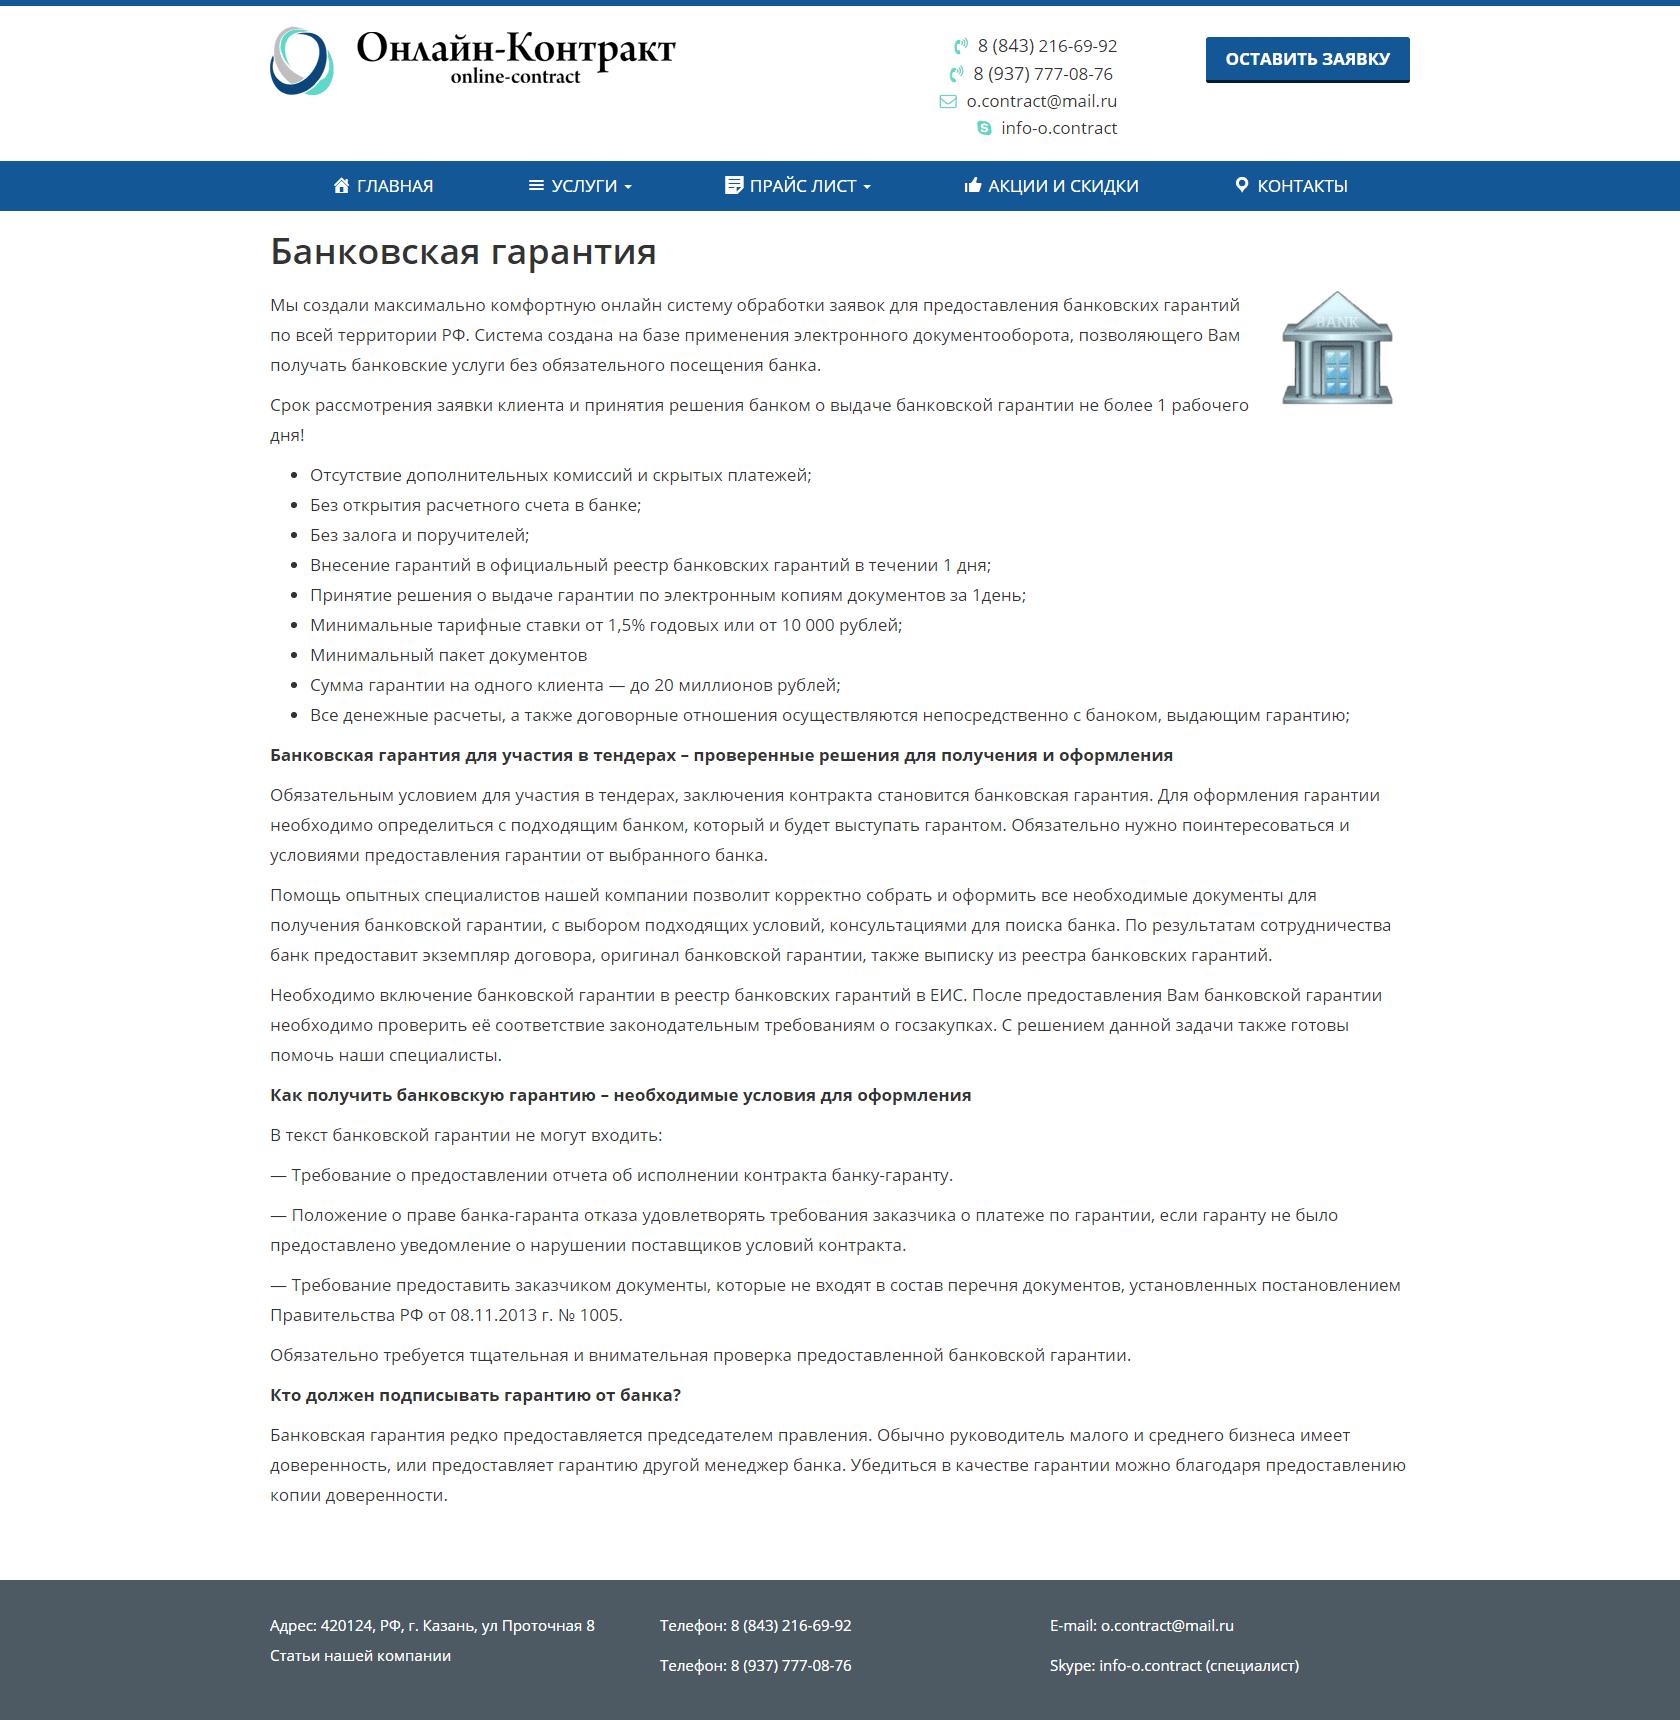 Онлайн-контракт